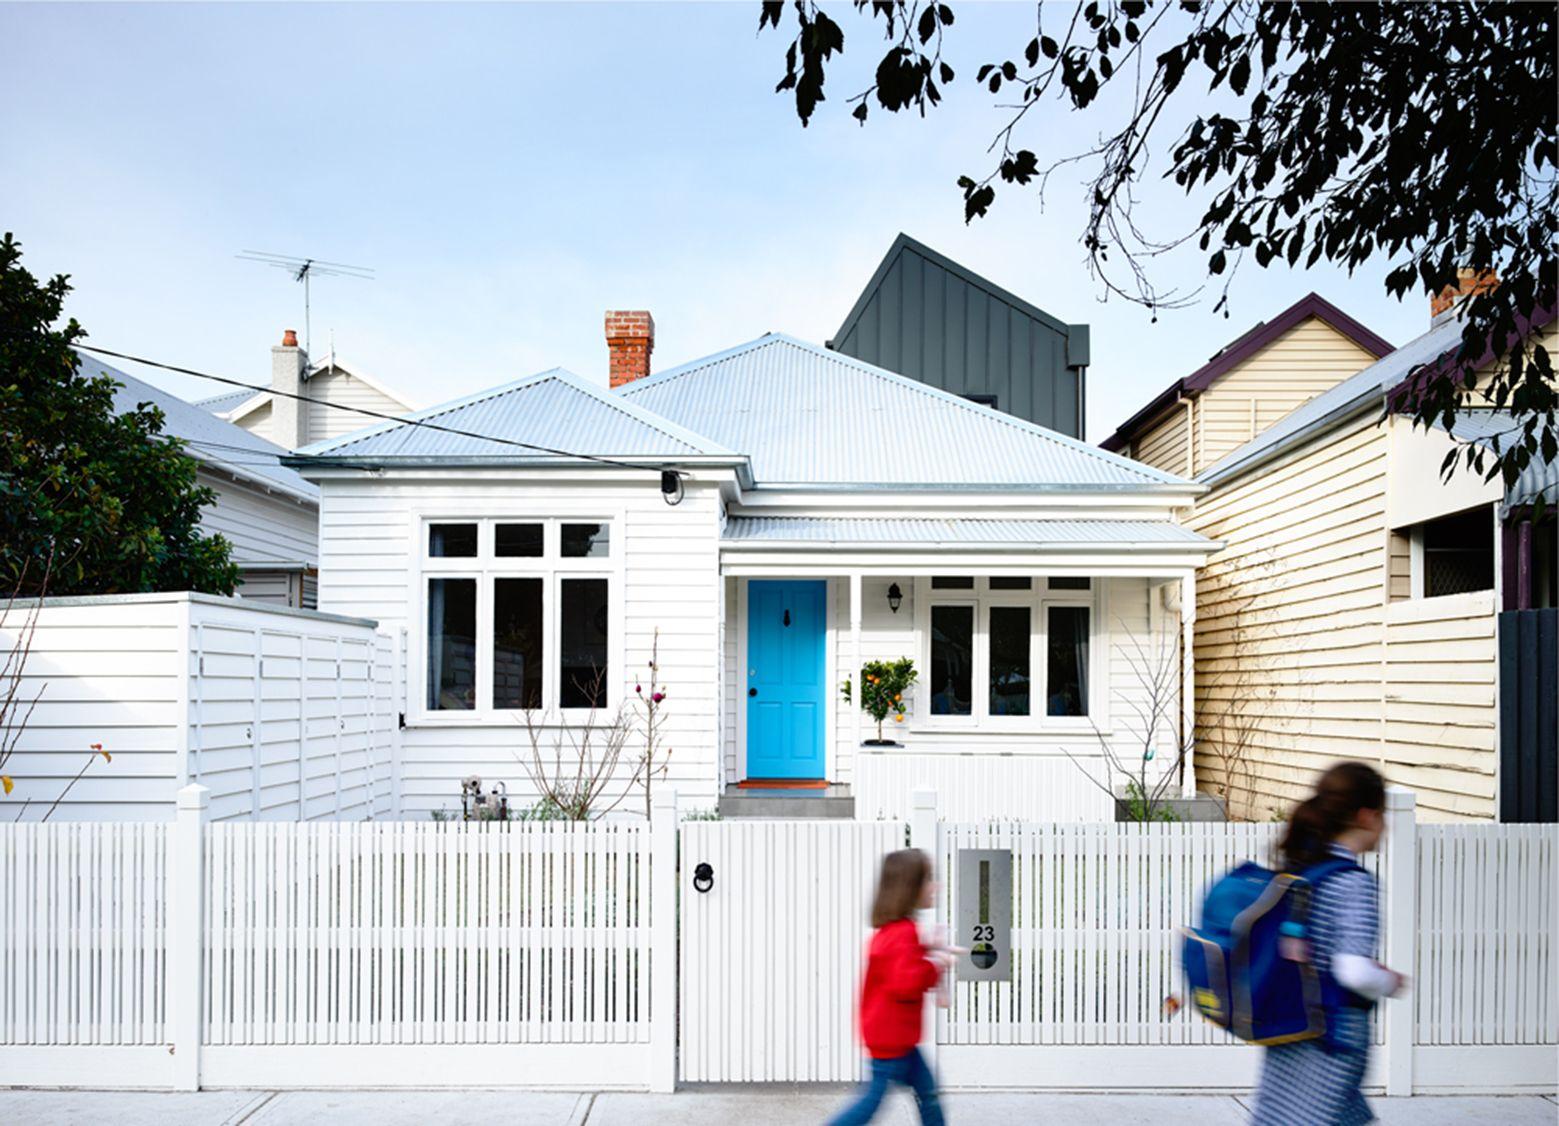 Set in sandringham australia this small house has had a twostorey